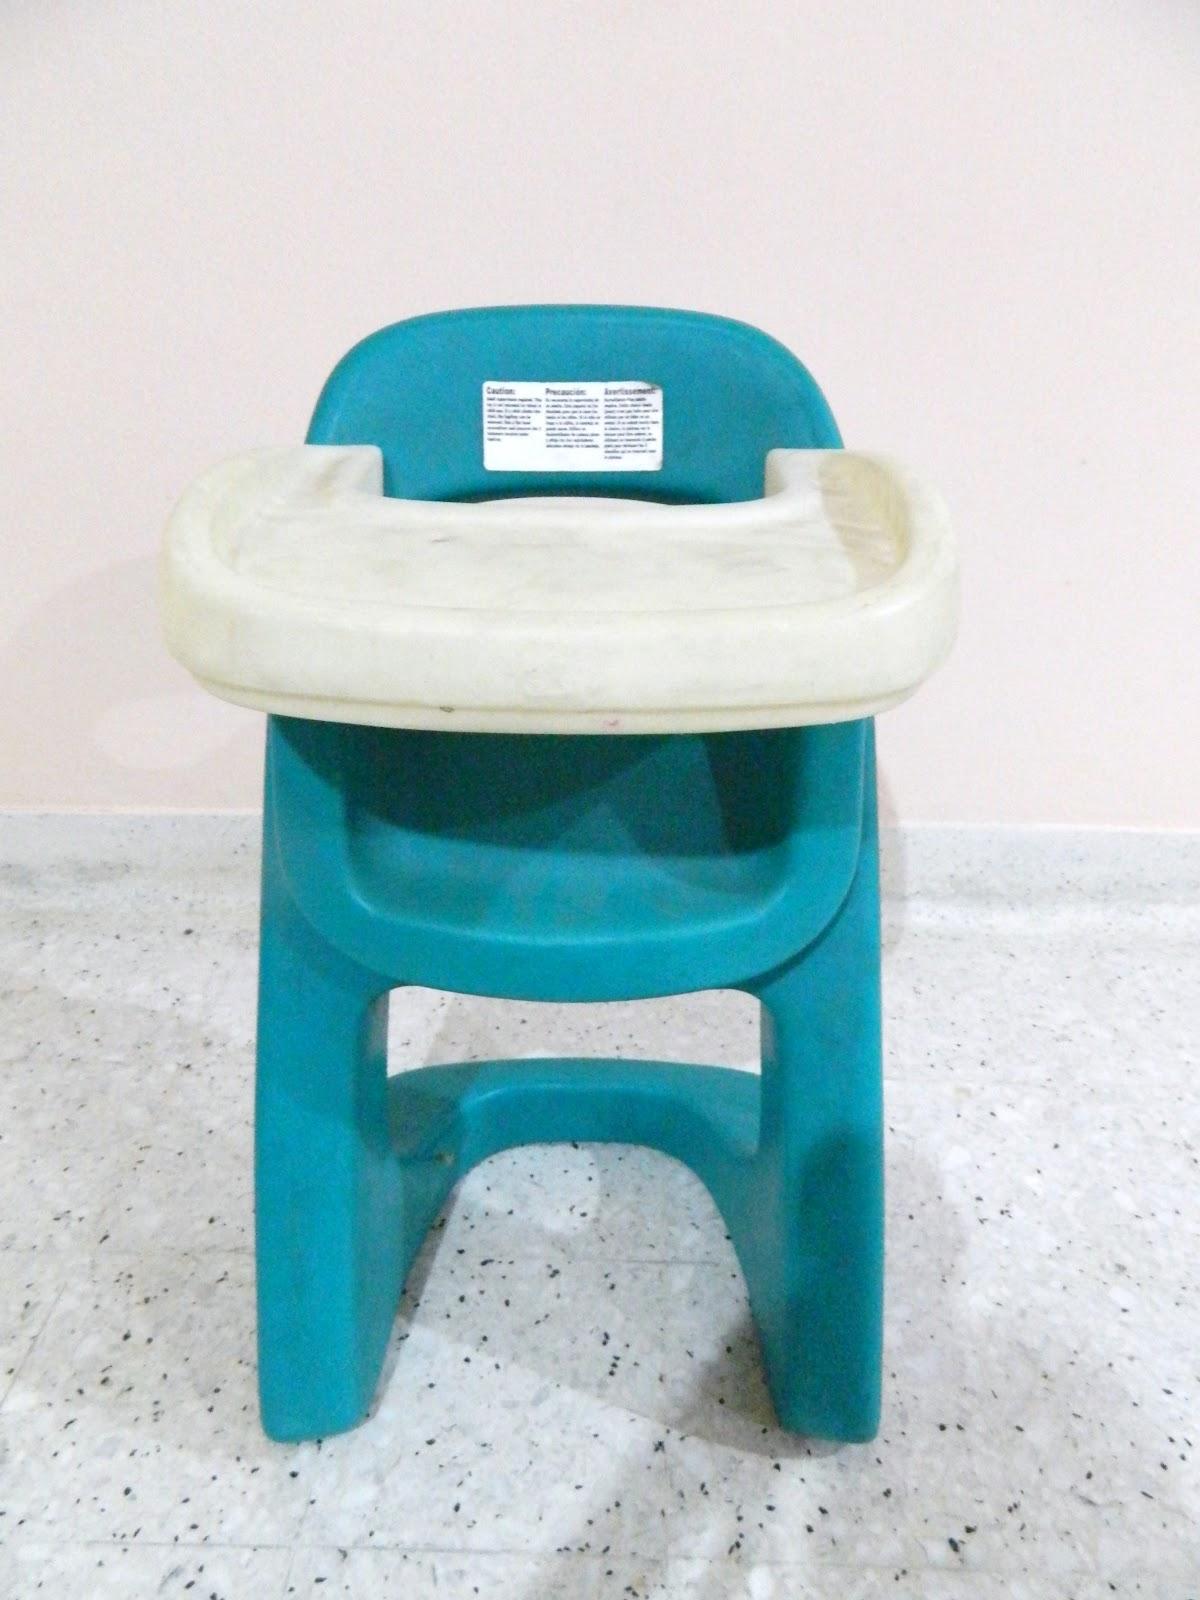 step 2 chair high heel save on toys doll